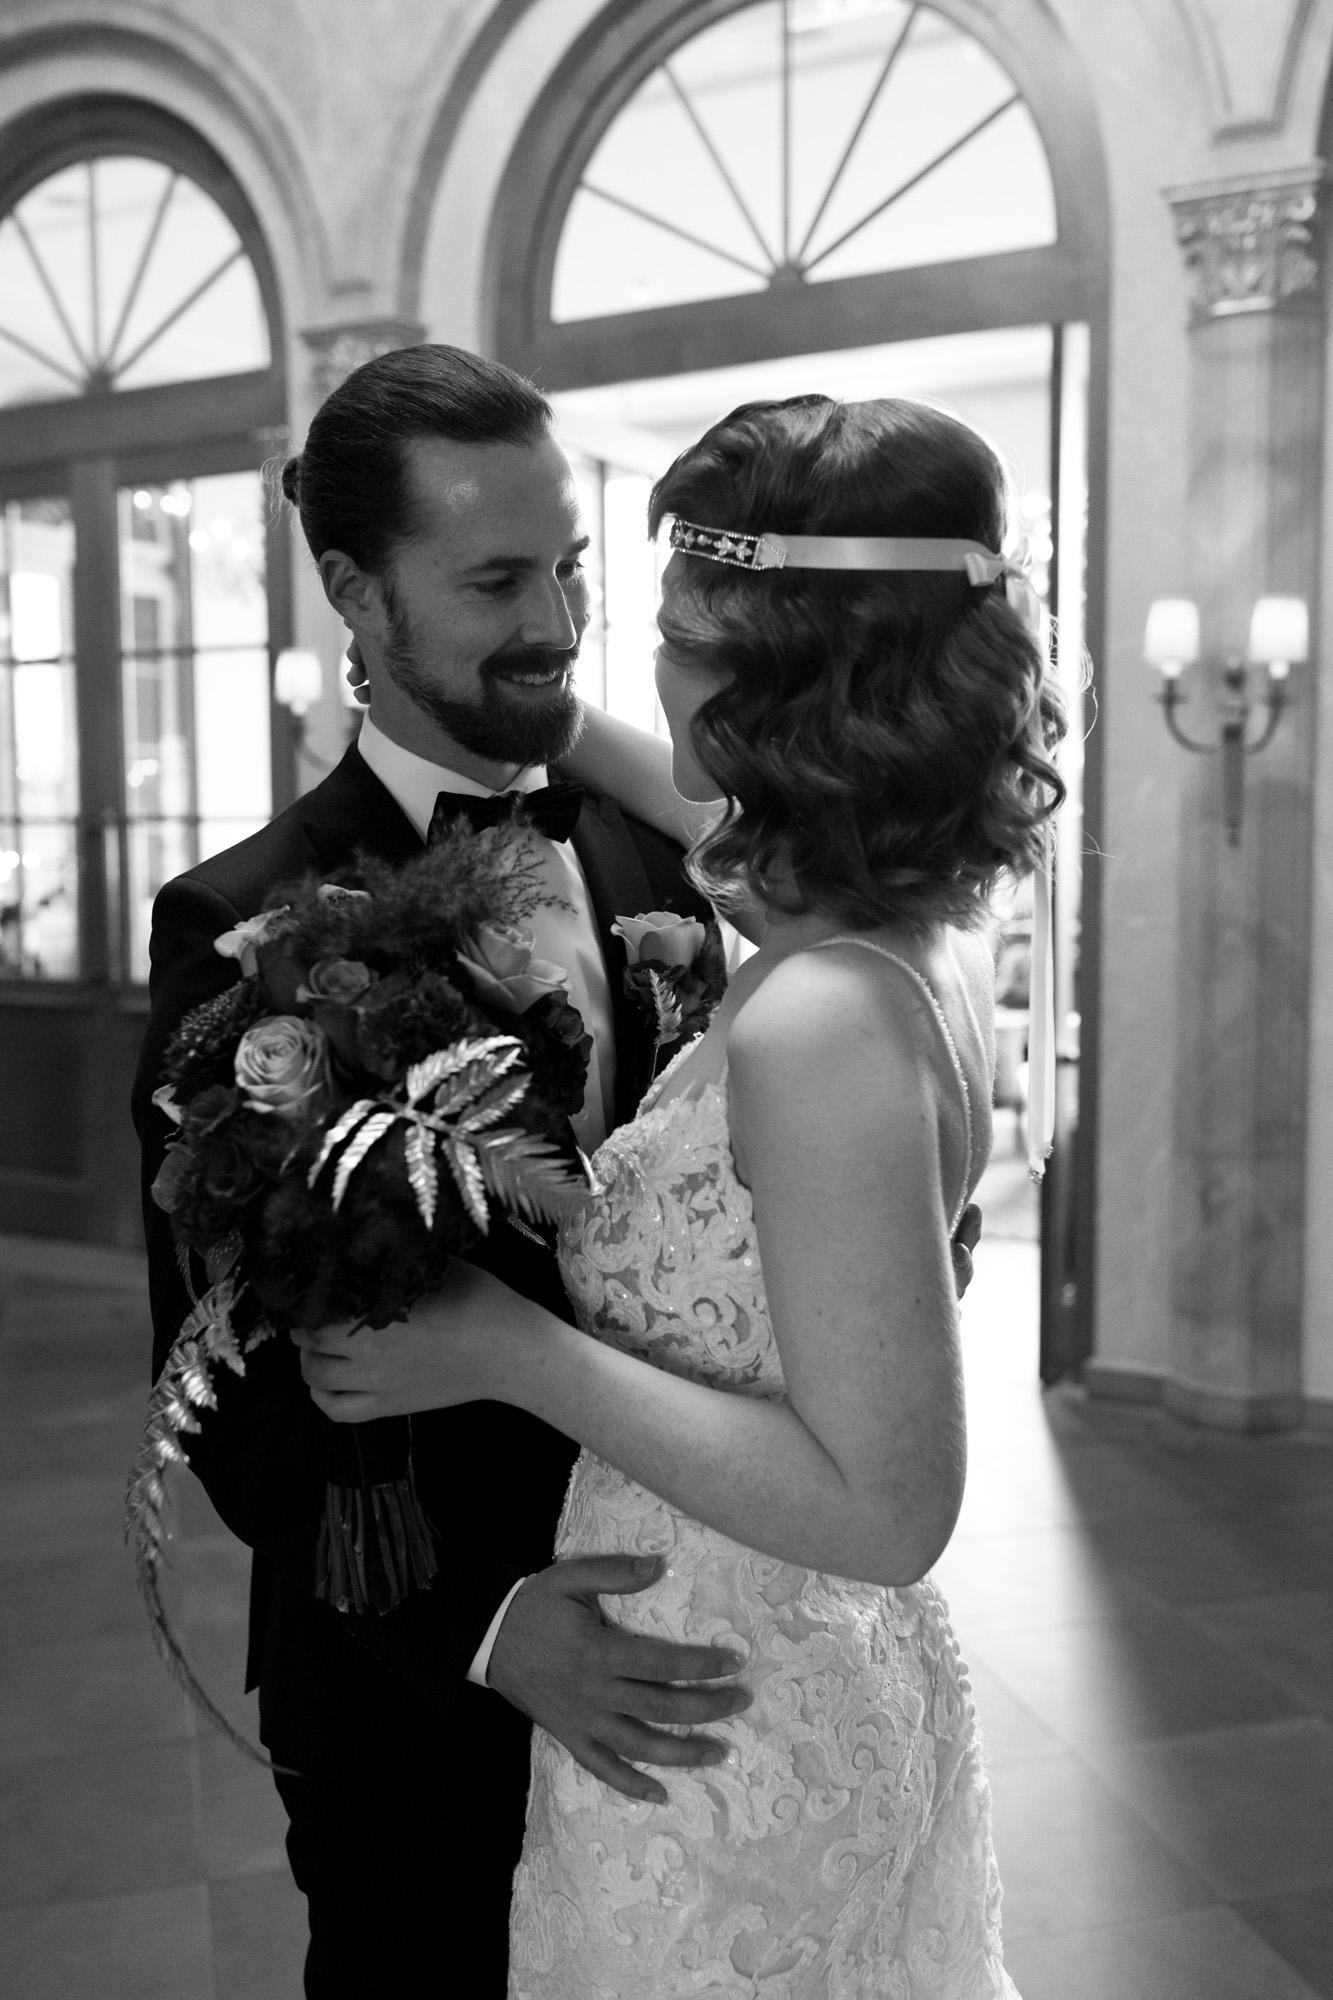 First Look Brautpaar Grand Hotel Les Trois Rois Basel - Hochzeitsfotografen Basel